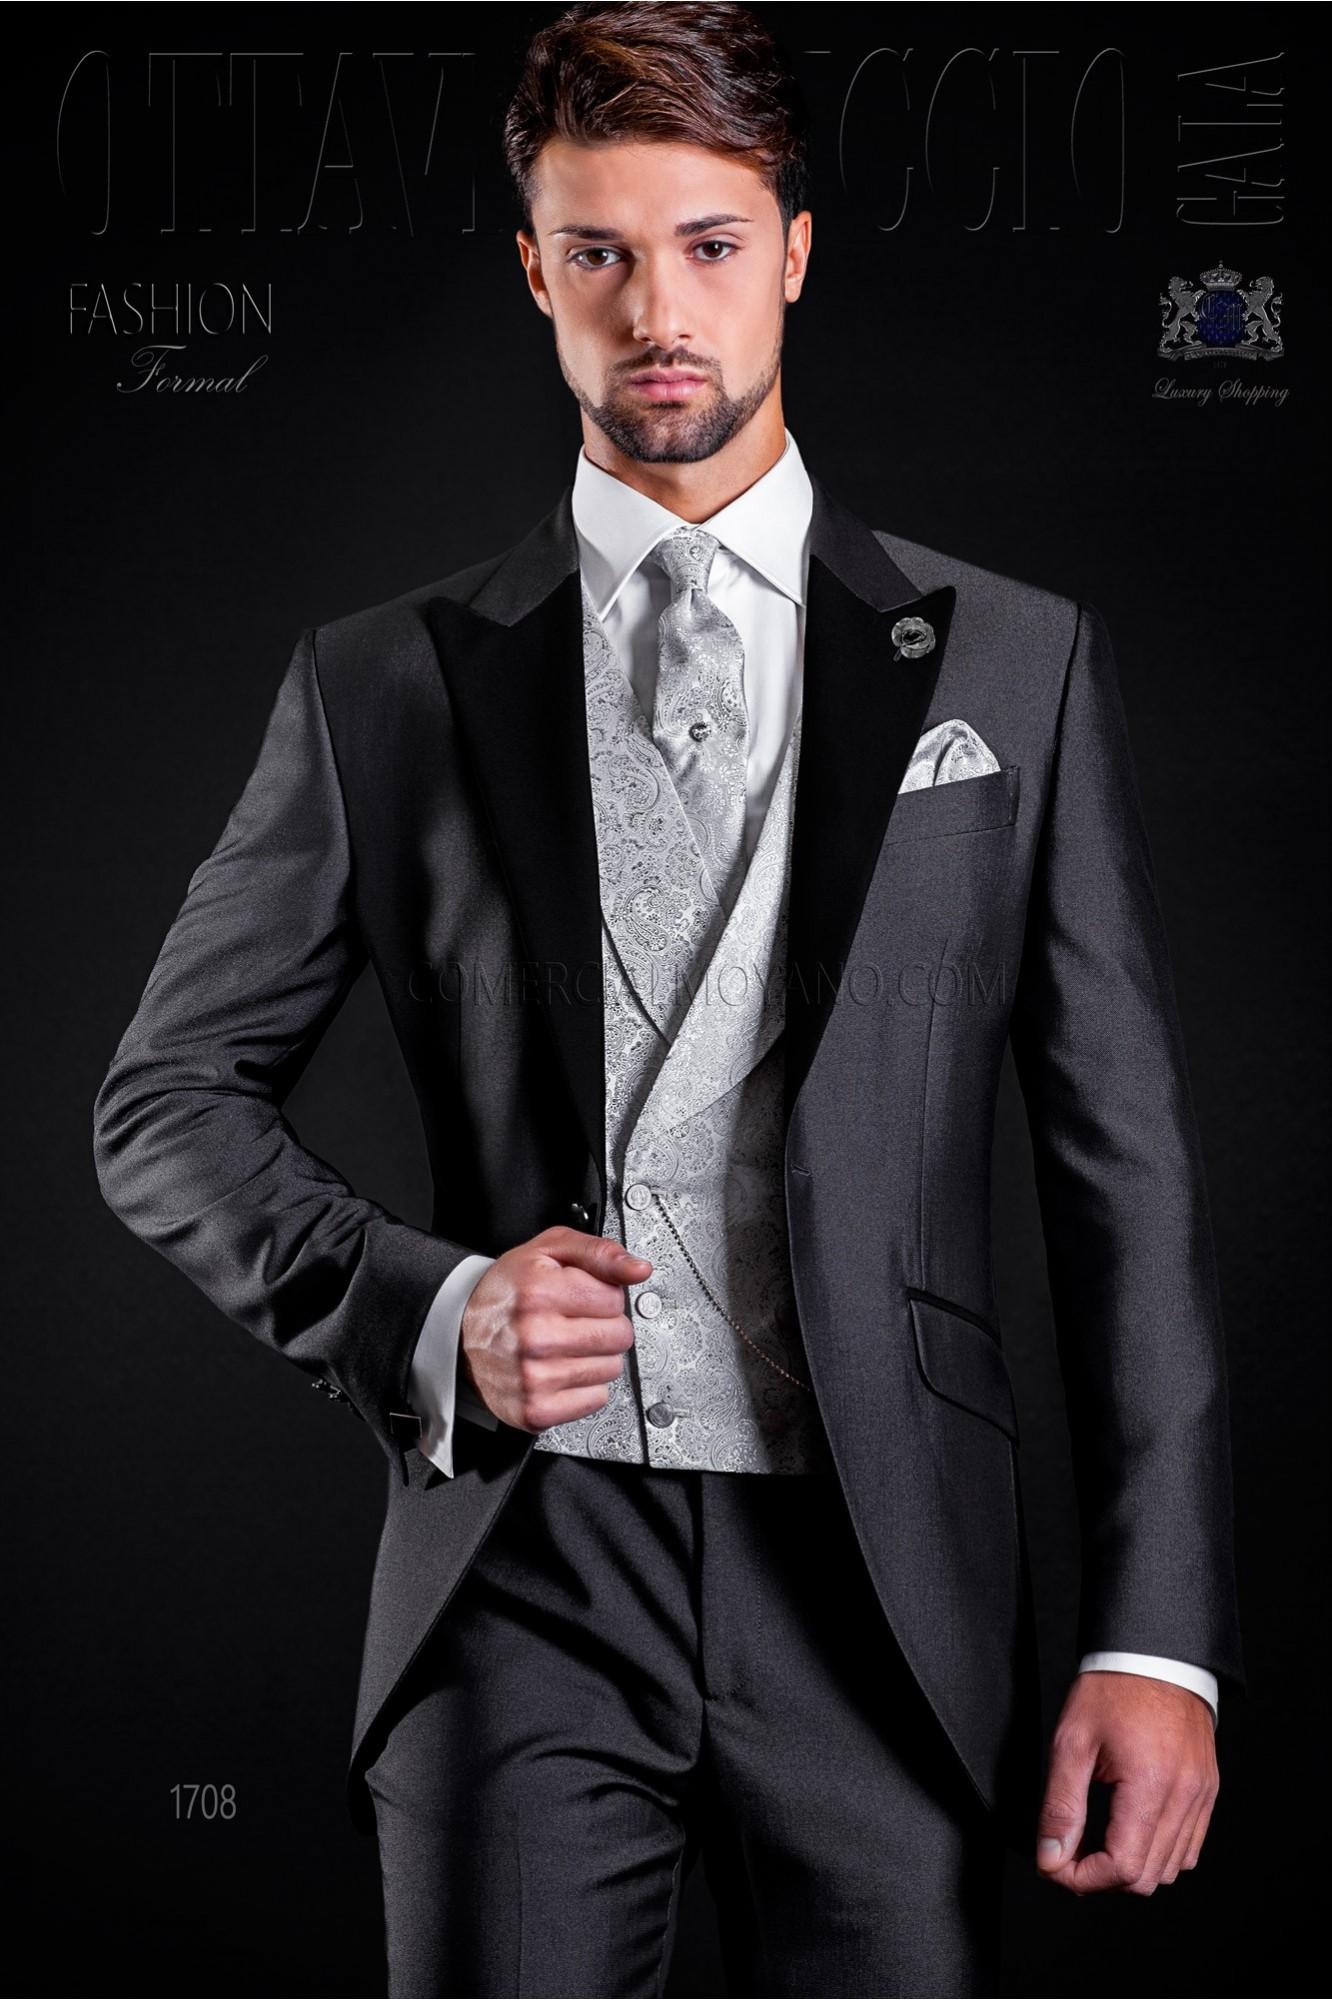 Traje de novio gris antracita con solapa raso negro modelo: 1708 Ottavio Nuccio Gala colección Fashion 2017